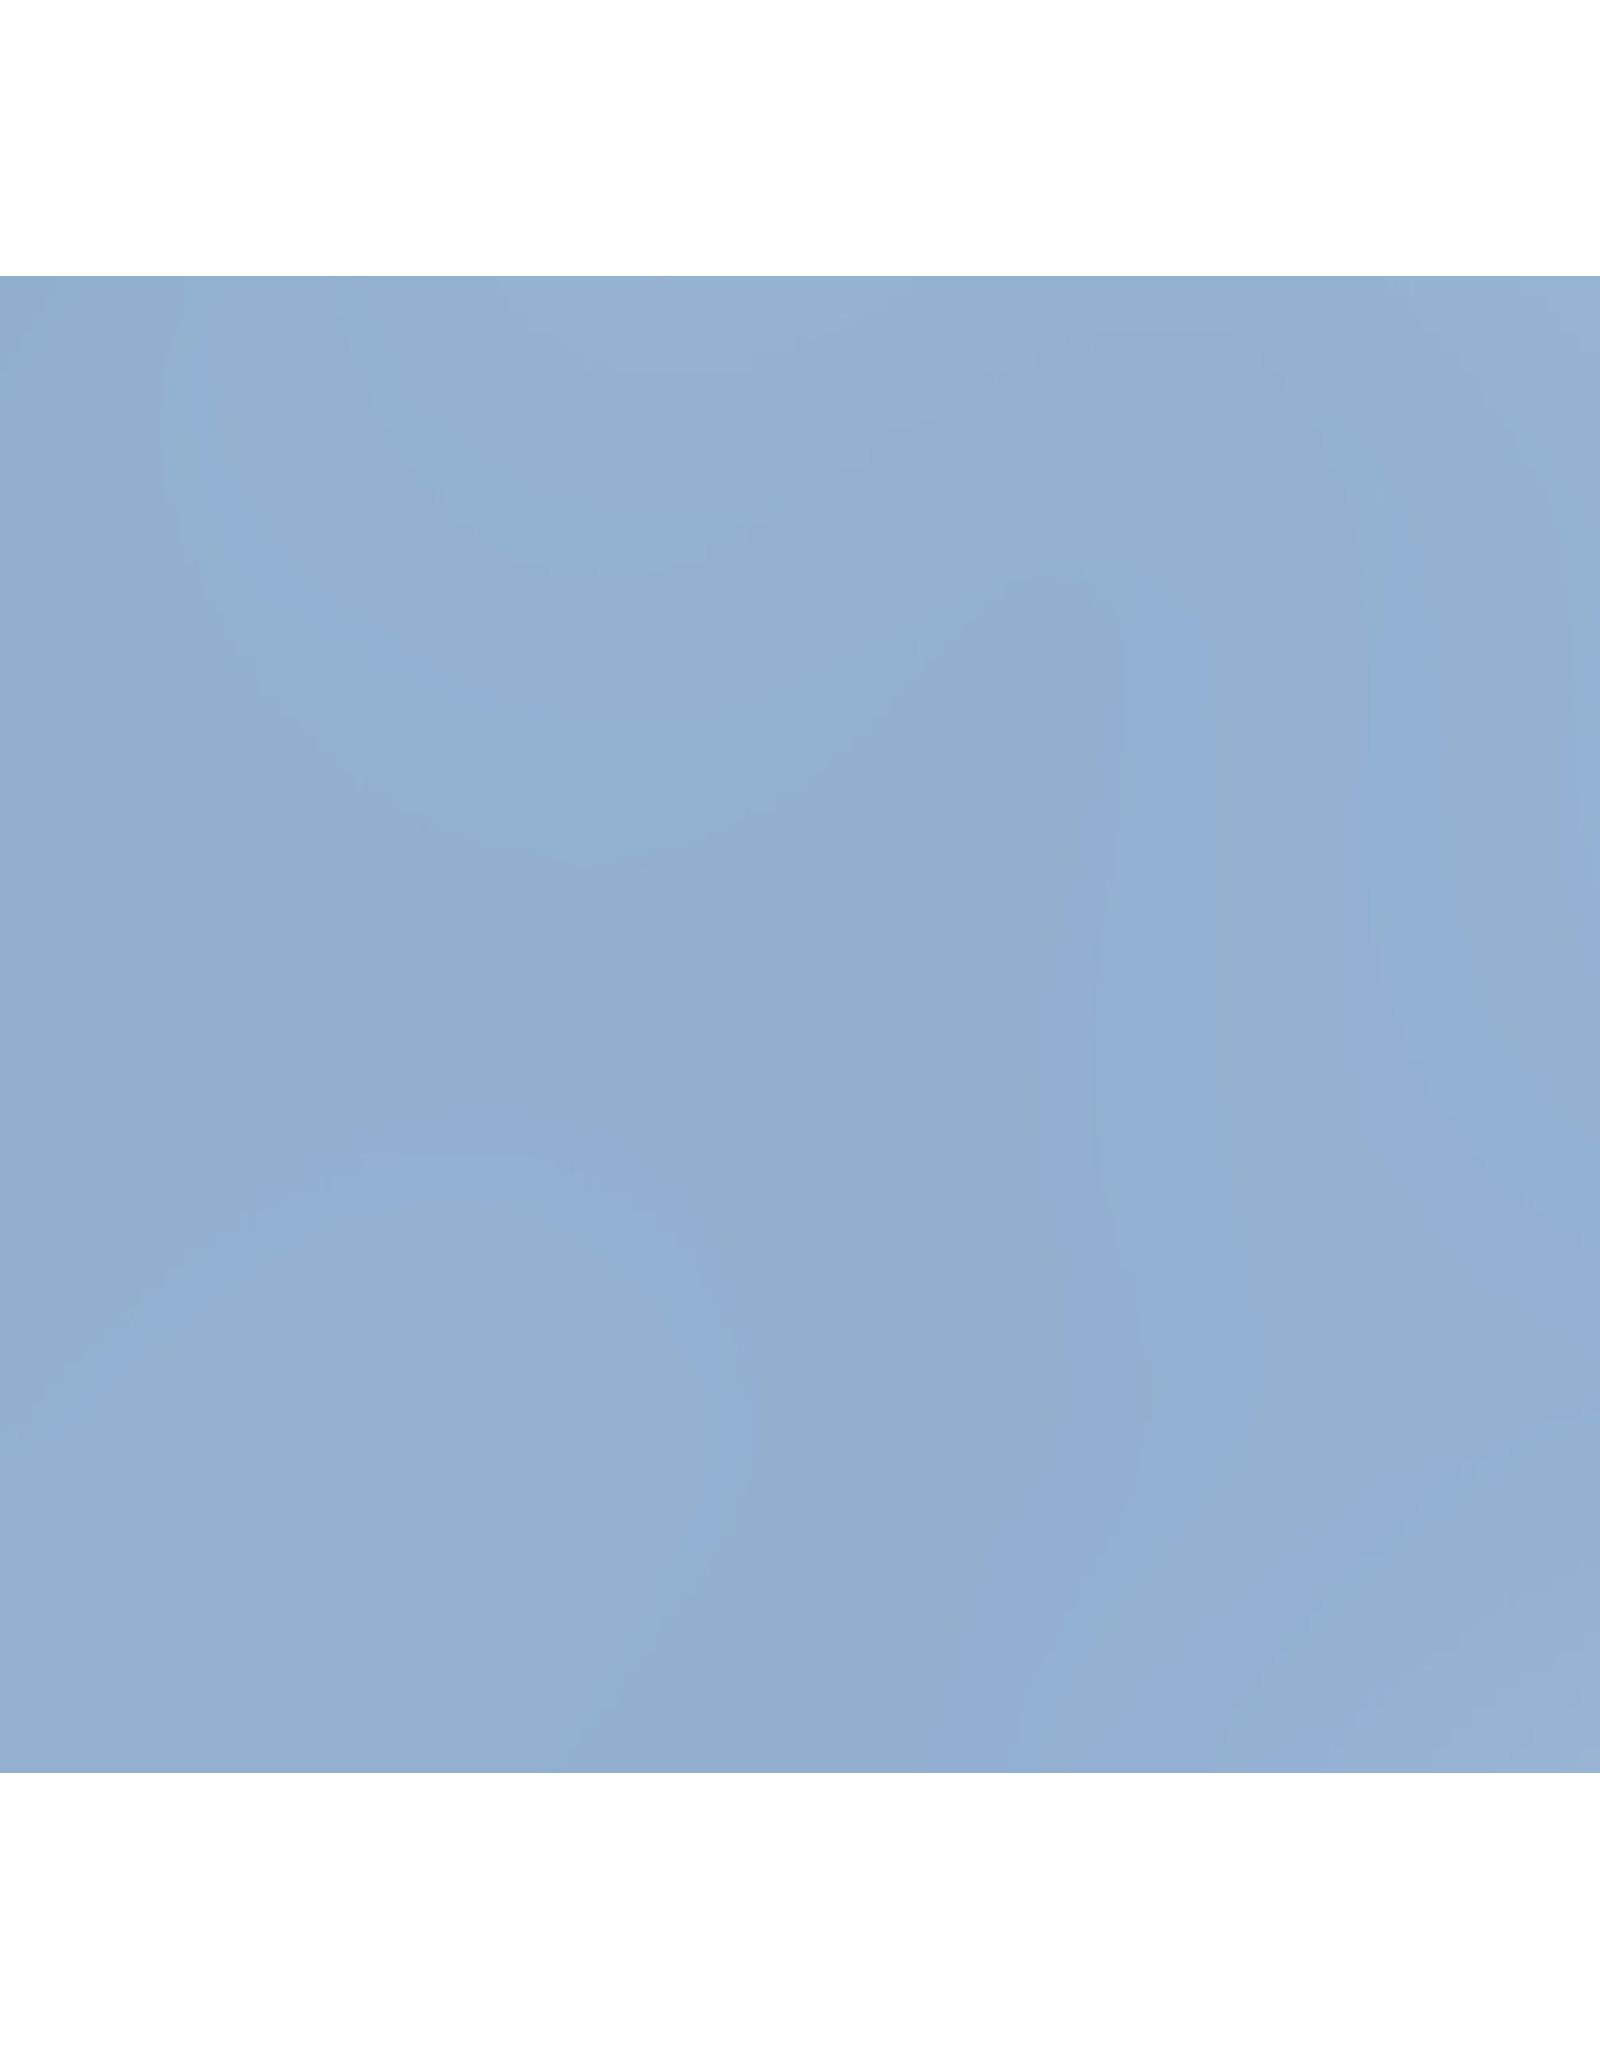 Bazzill Bazzill Card Shoppe 8.5x11 - Candy Pearls